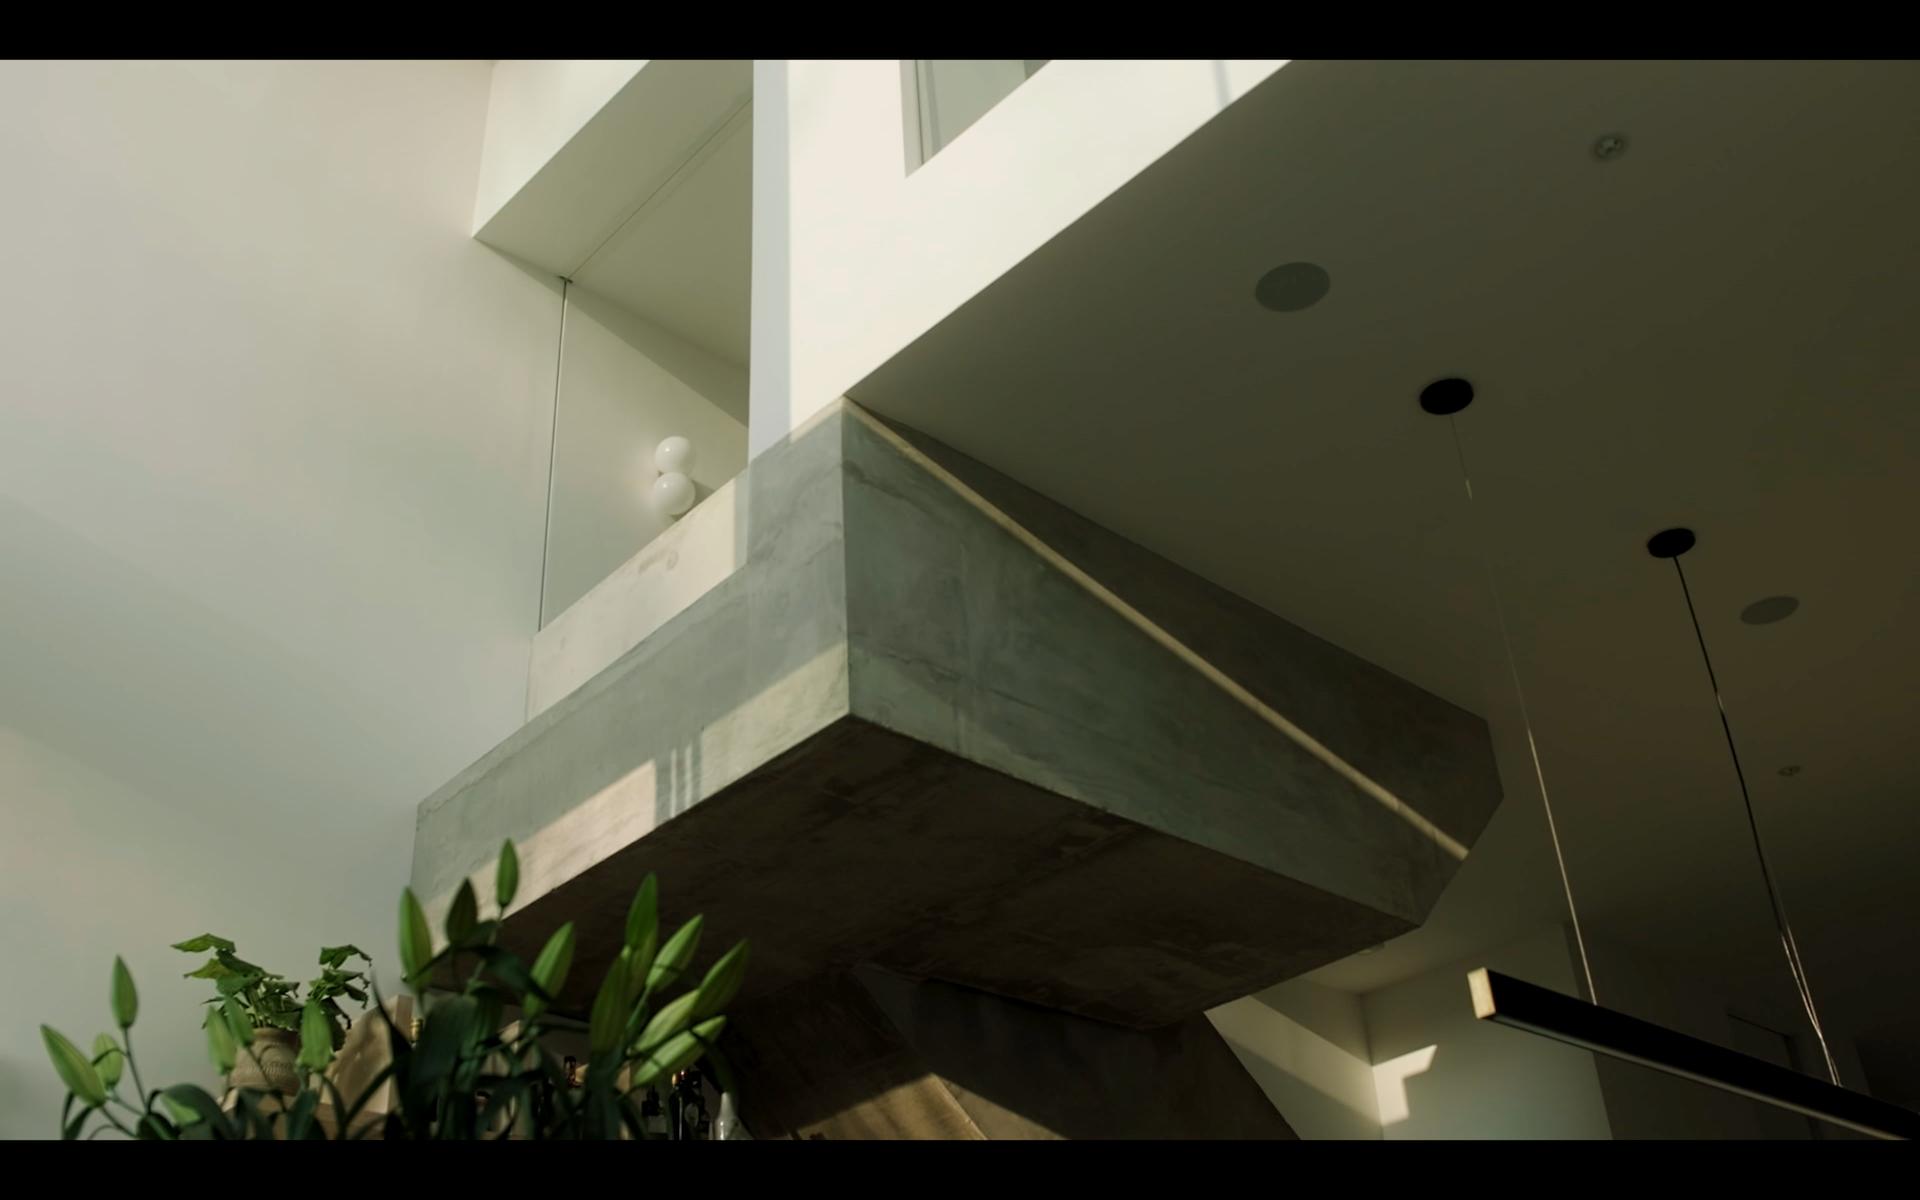 KYLE MACFADZEAN - Screenshot 2021-04-26 at 00.33.38